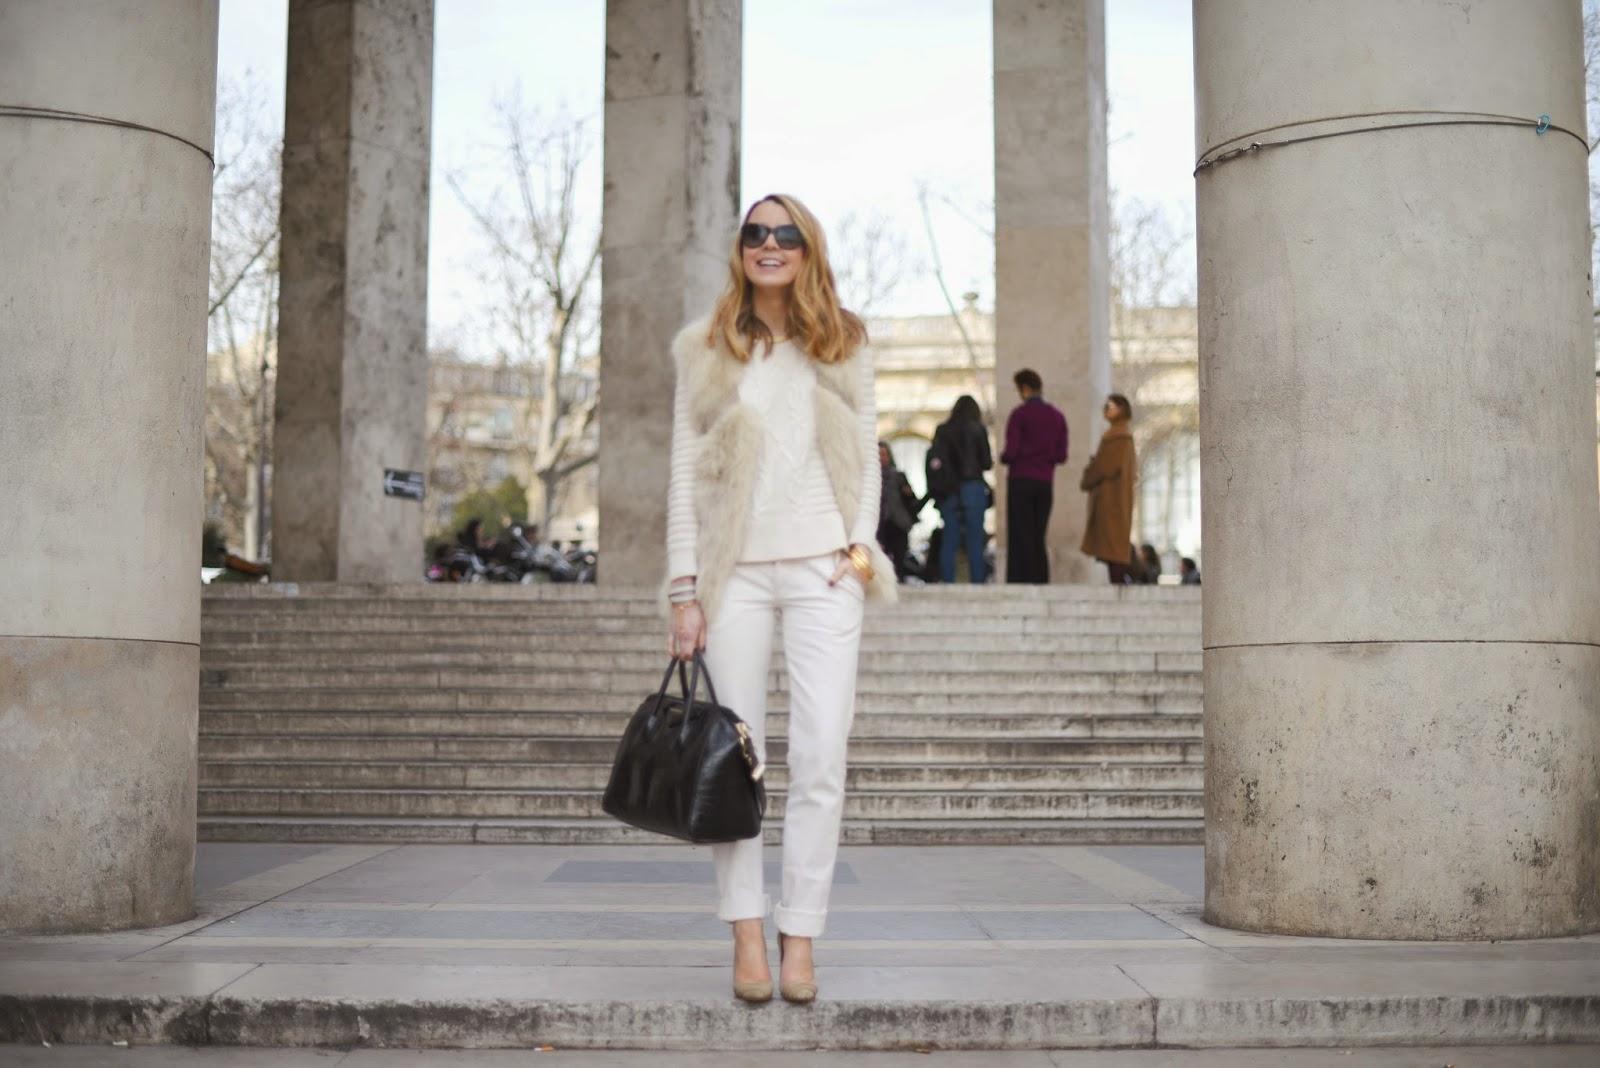 paris fashion week, all white, maje, sandro, isabel marant, givenchy, iro, pardon my obsession, streetstyle